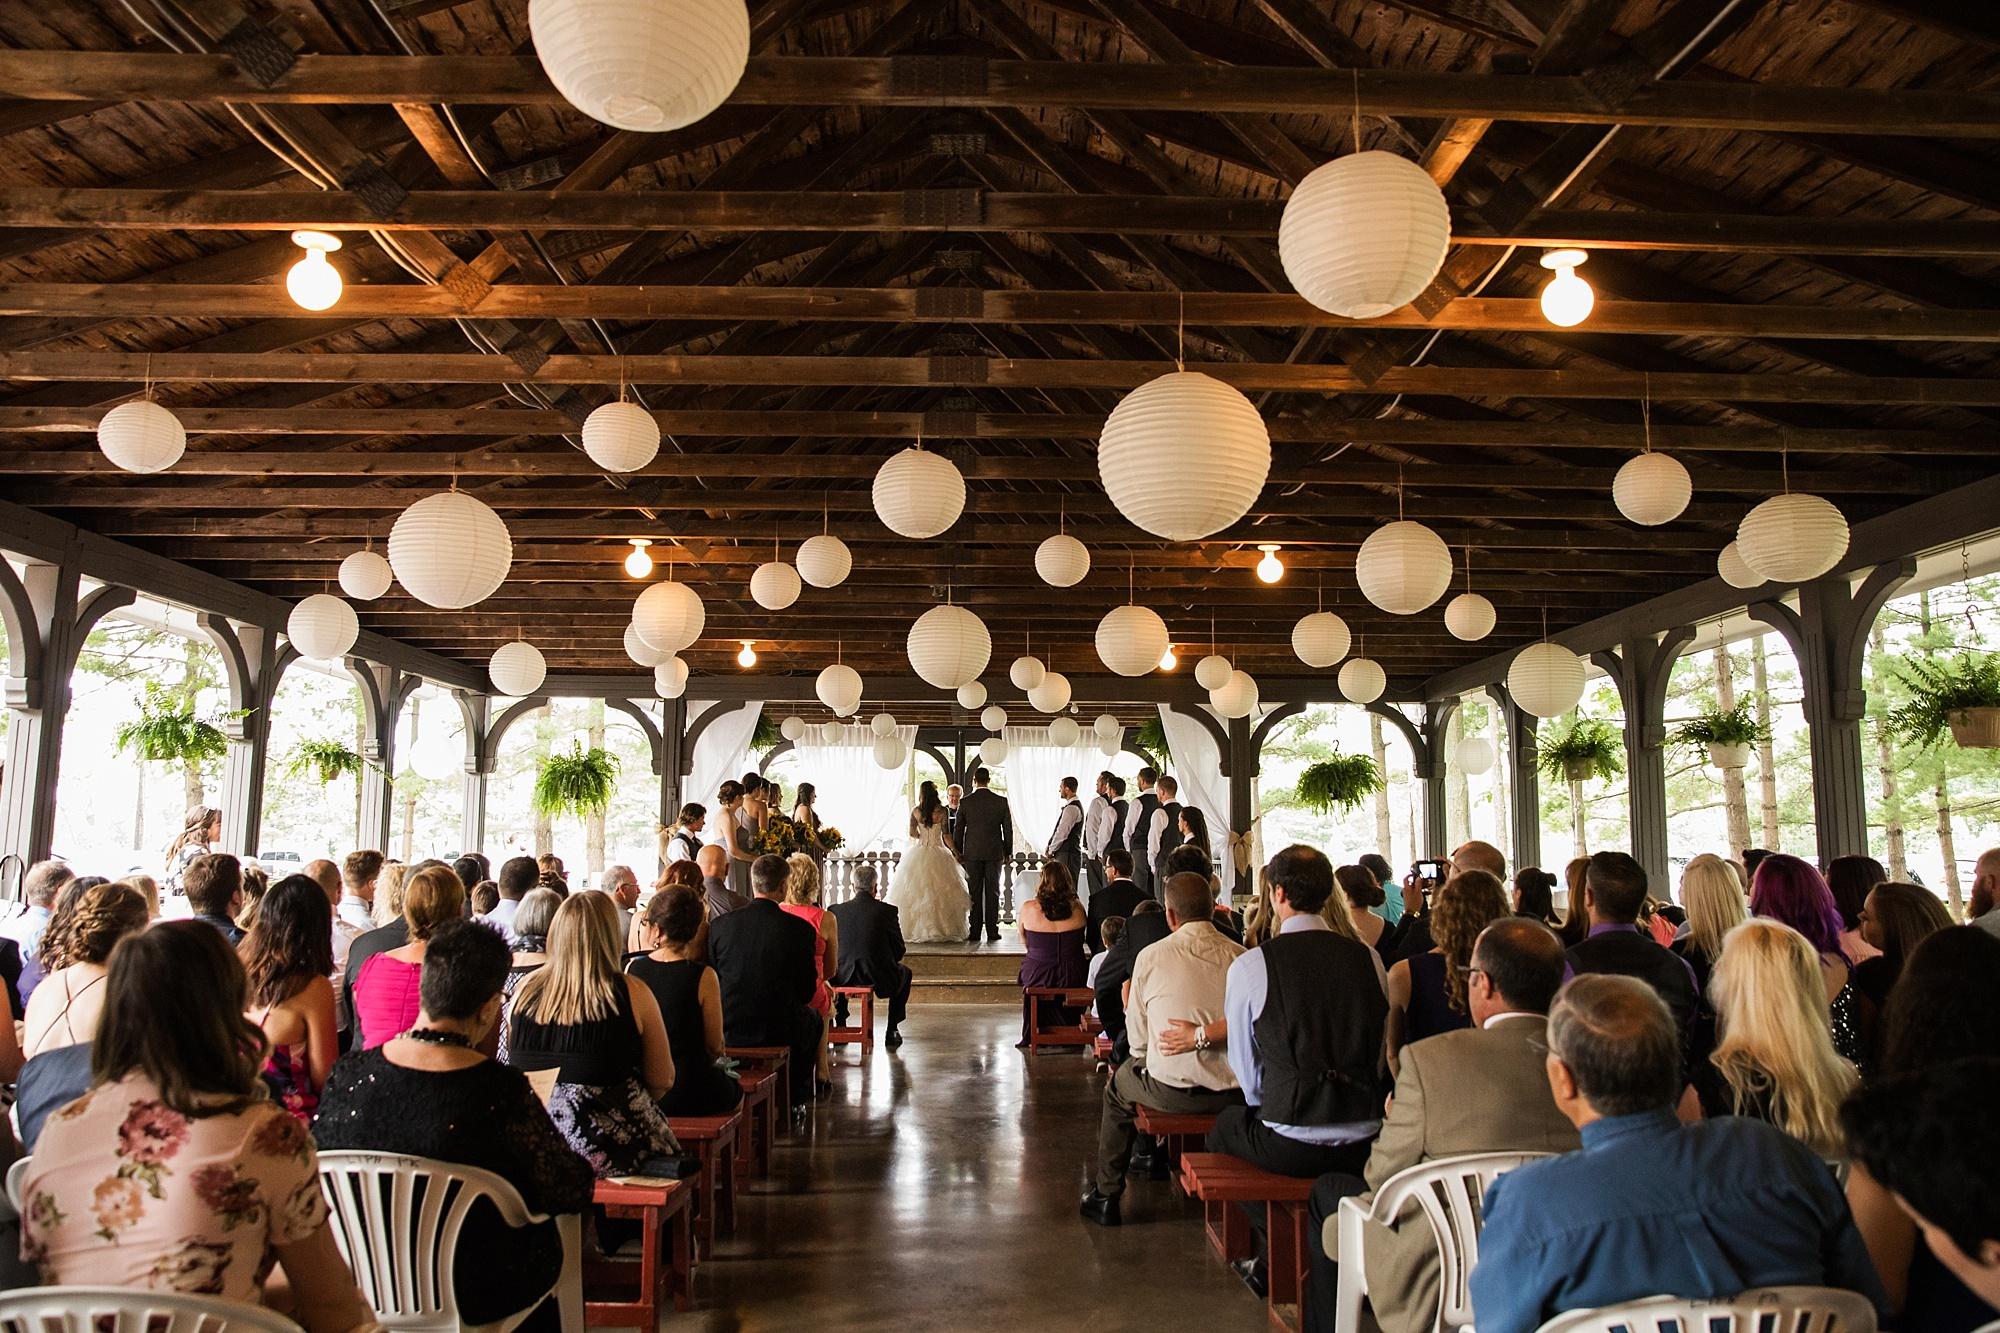 lipapark-hernderwinery-wedding_0060.jpg